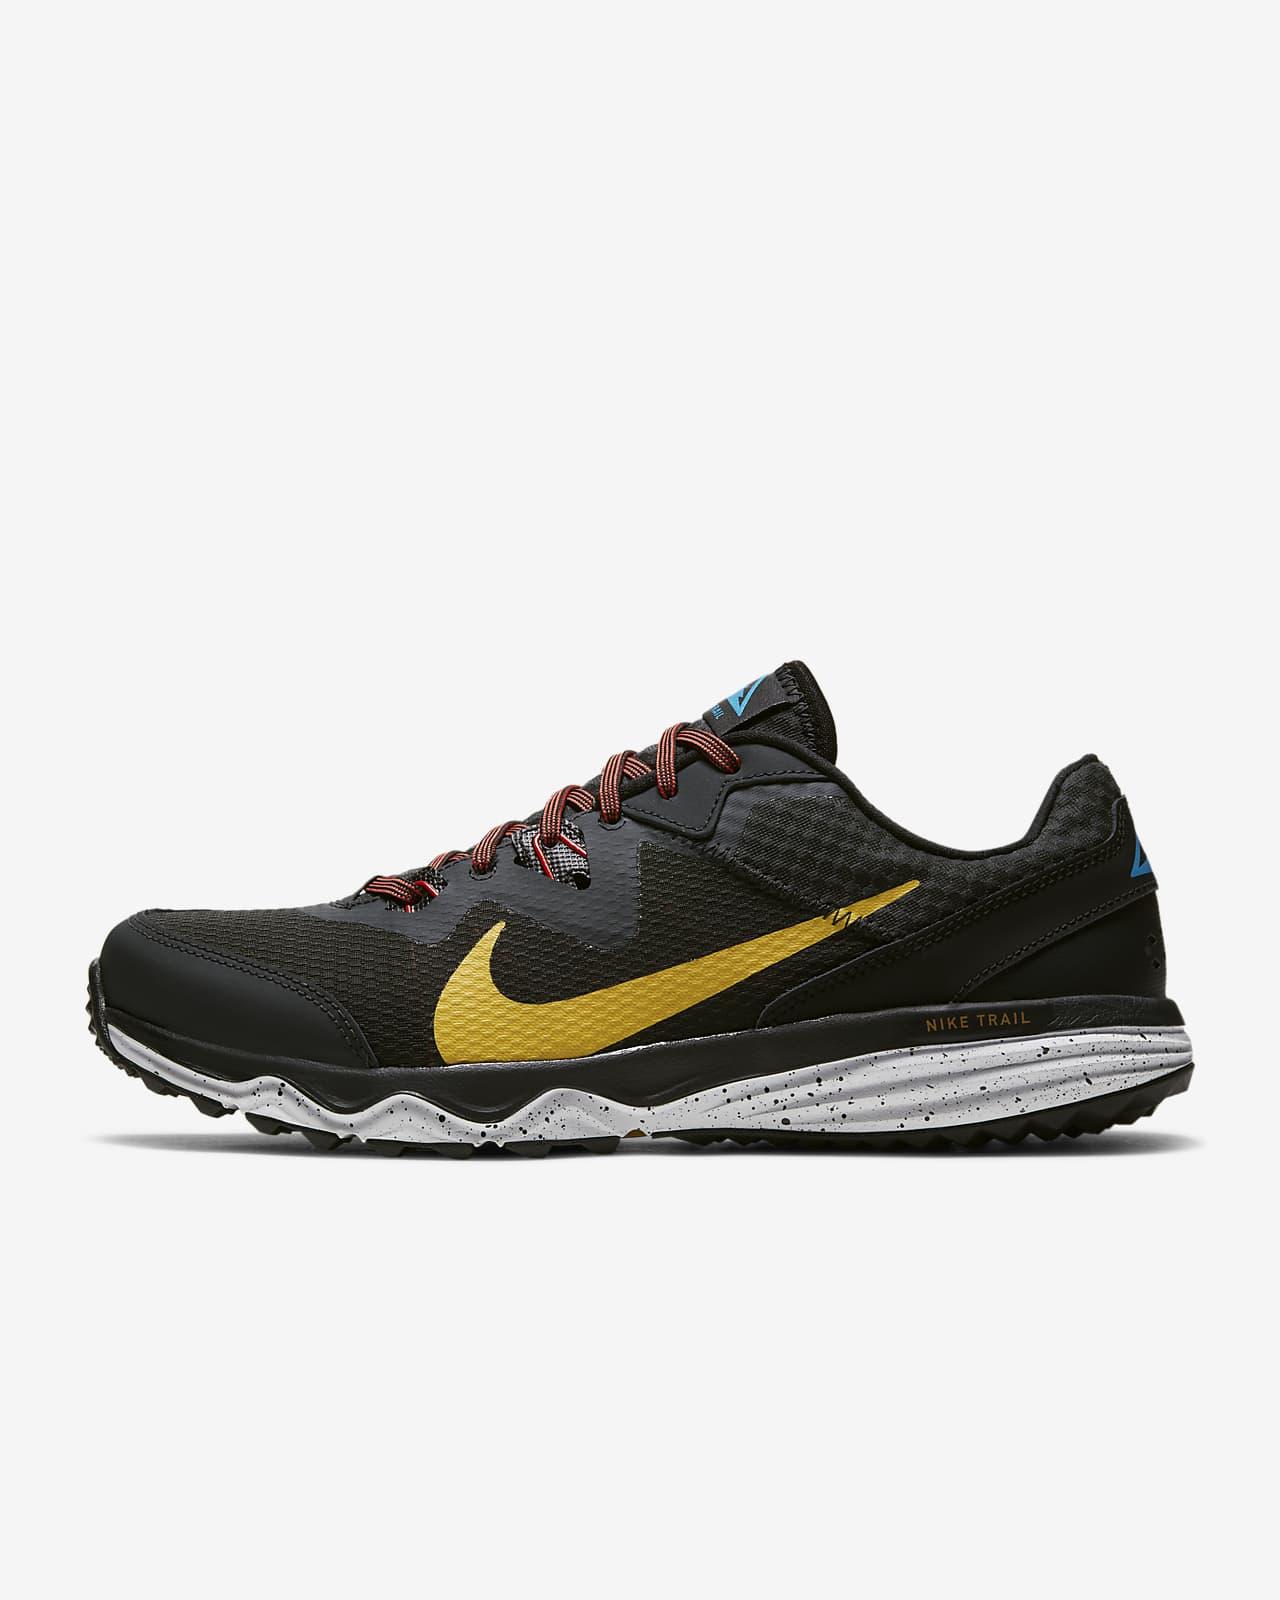 Calzado de trail running para hombre Nike Juniper Trail